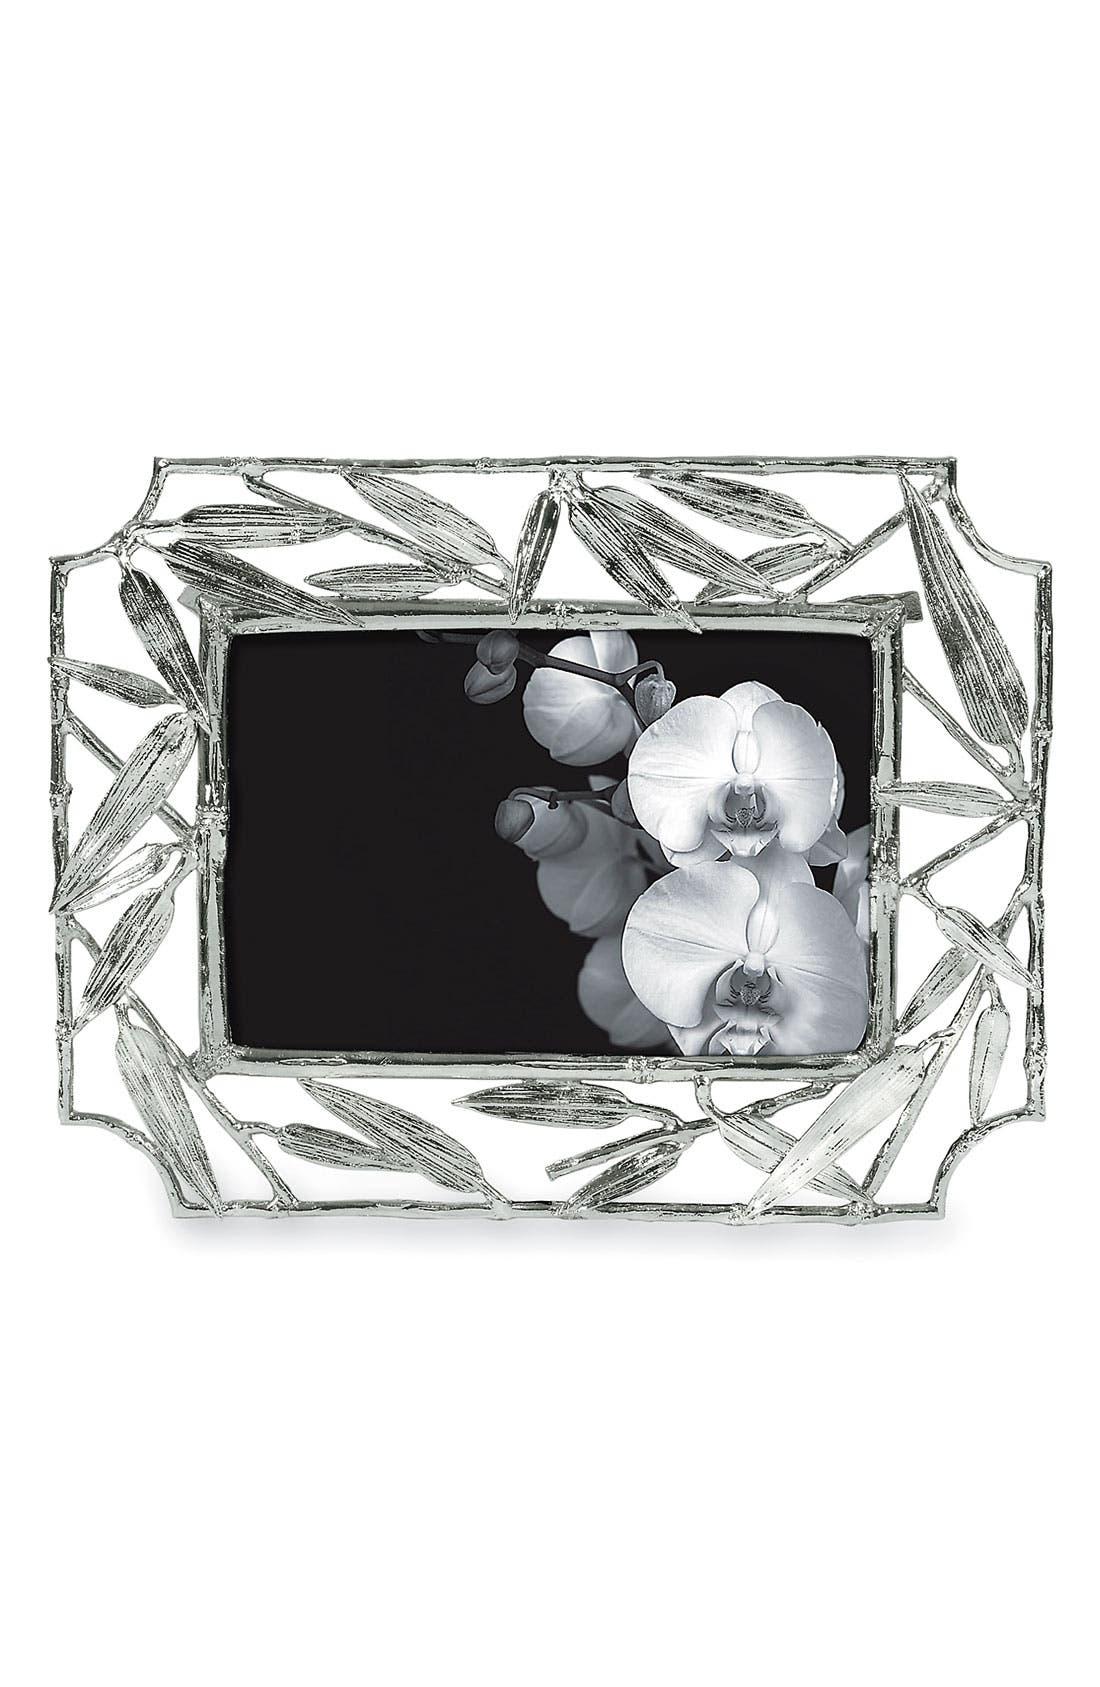 Alternate Image 1 Selected - Michael Aram 'Bamboo' 4x6 Frame